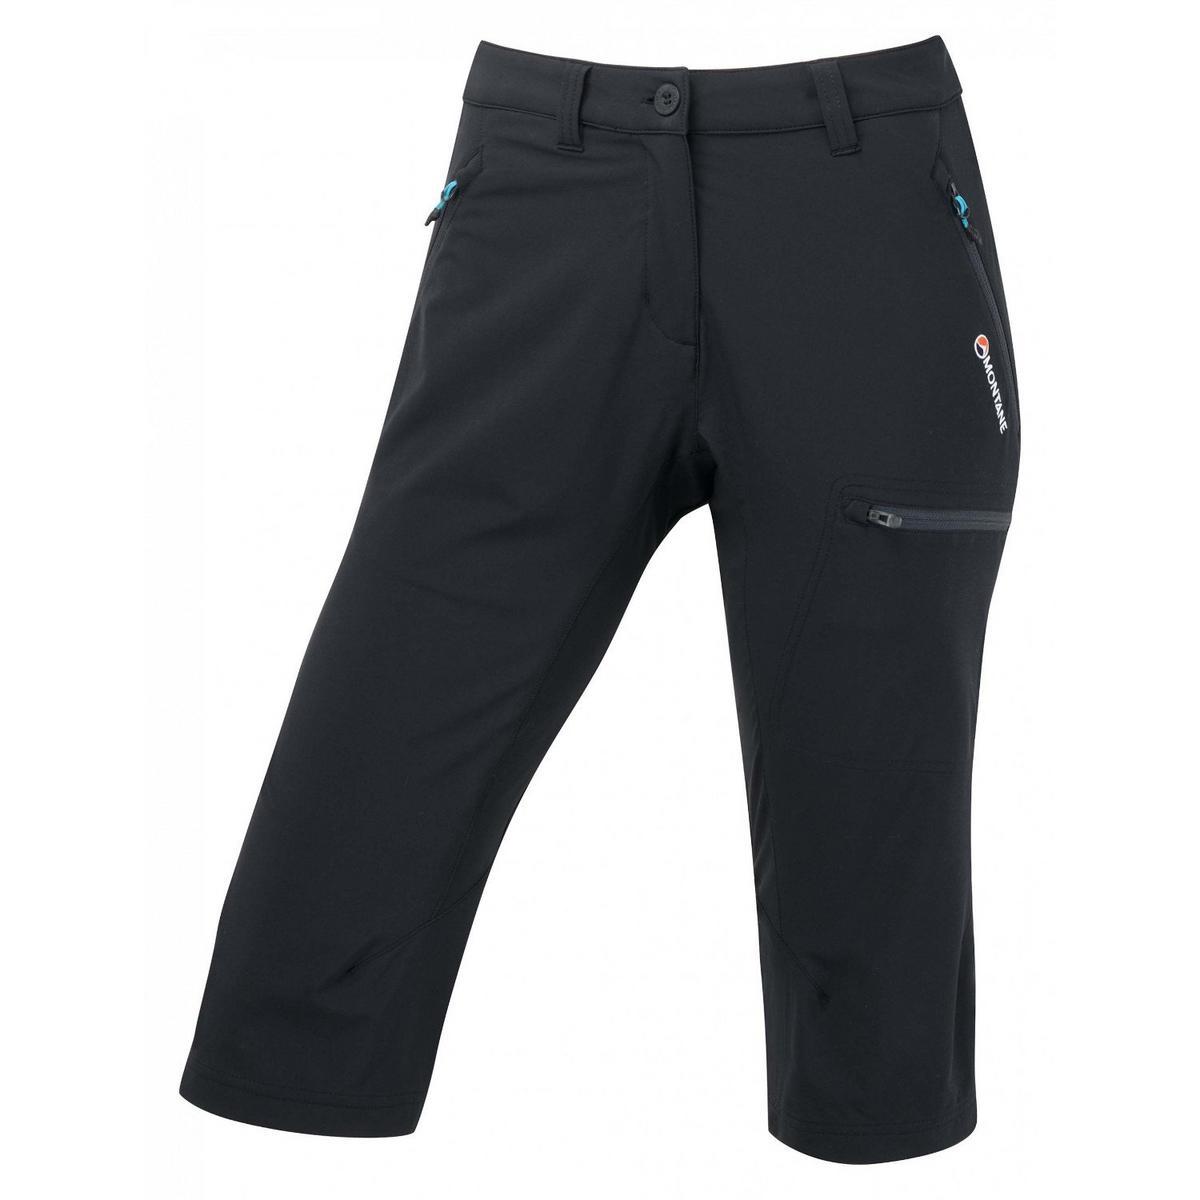 Montane Pant Women's Dyno Stretch Capri Black/Phantom